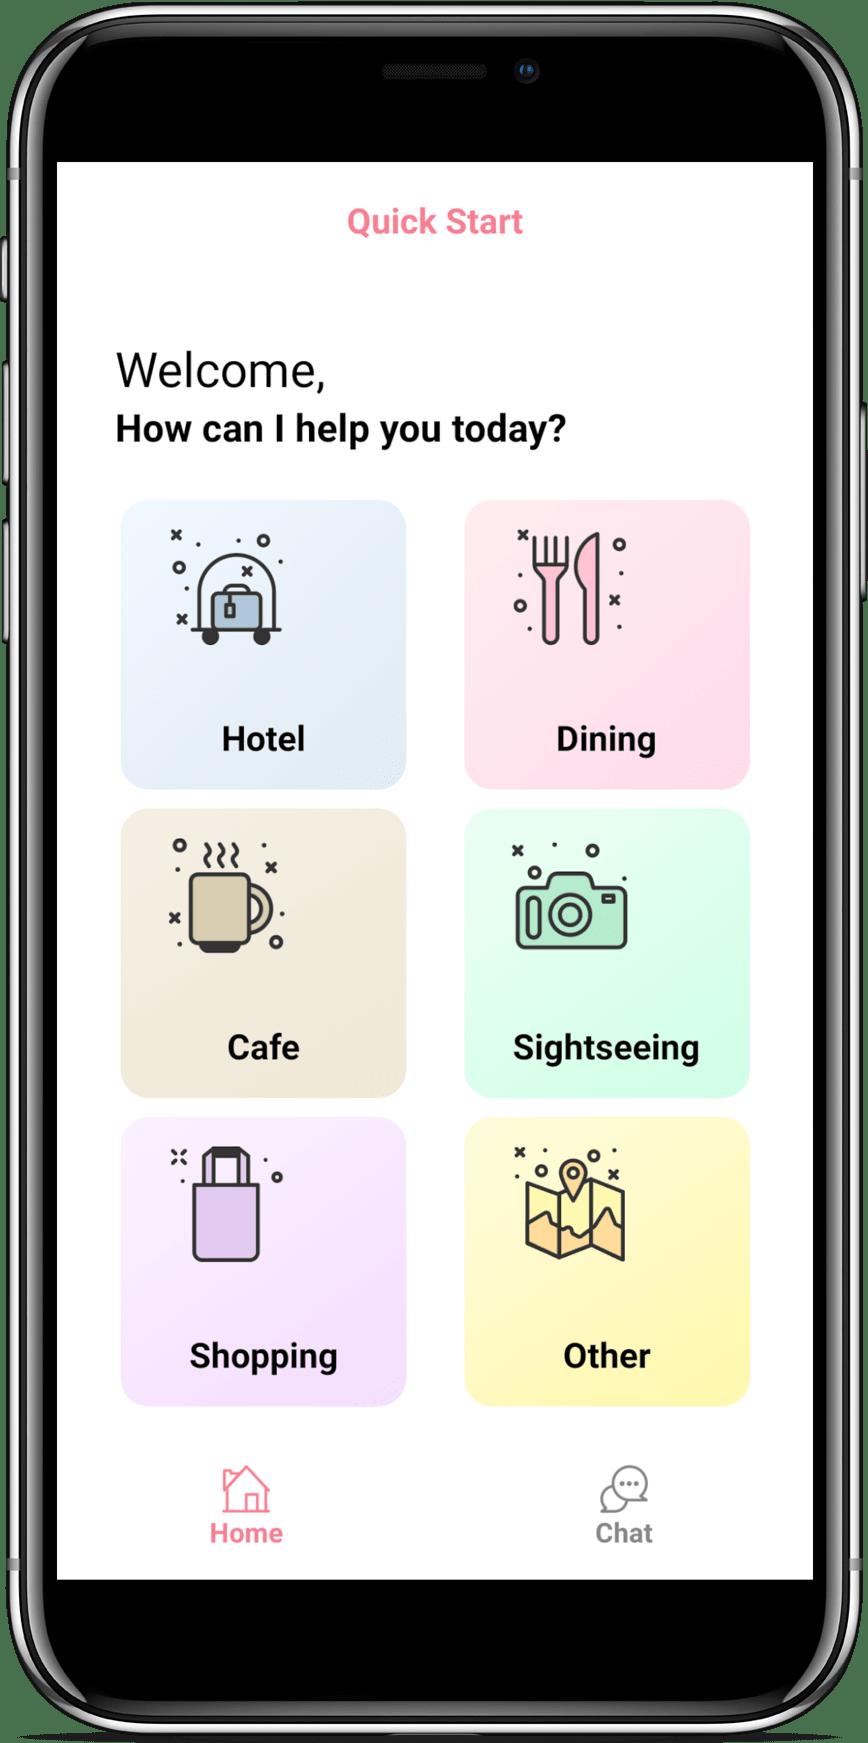 iPhone_app_image